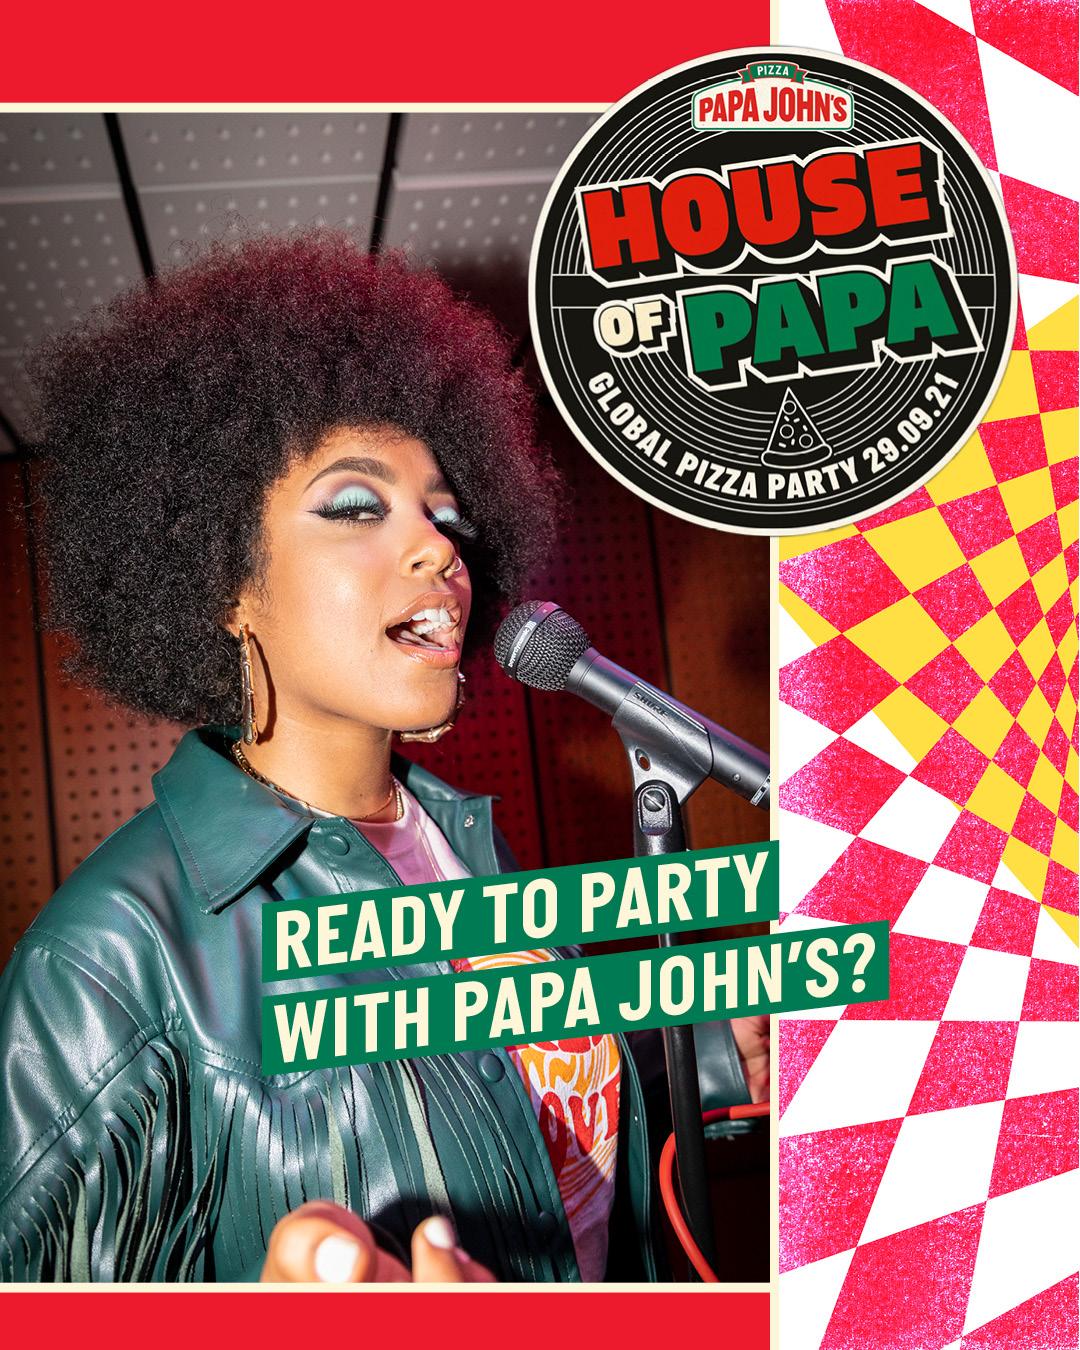 House of Papa